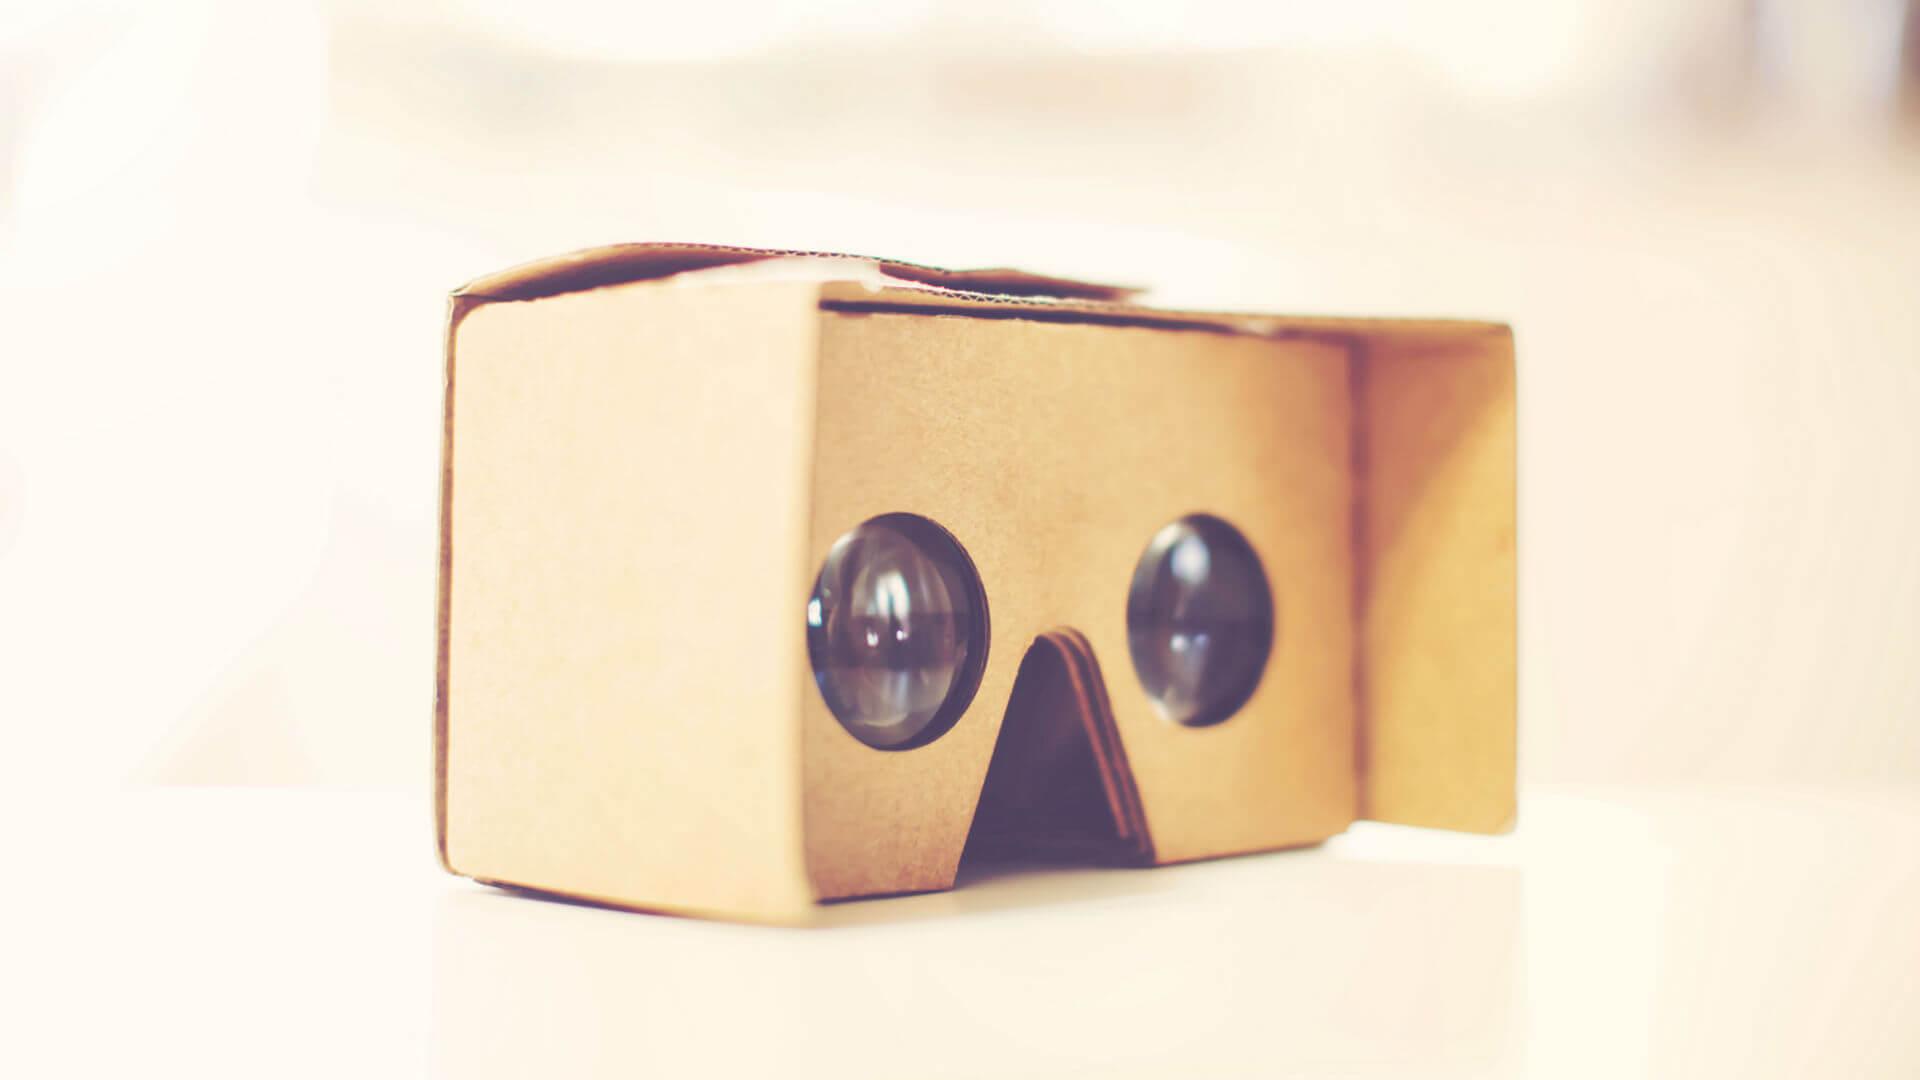 google-cardboard-vr-ss-1920